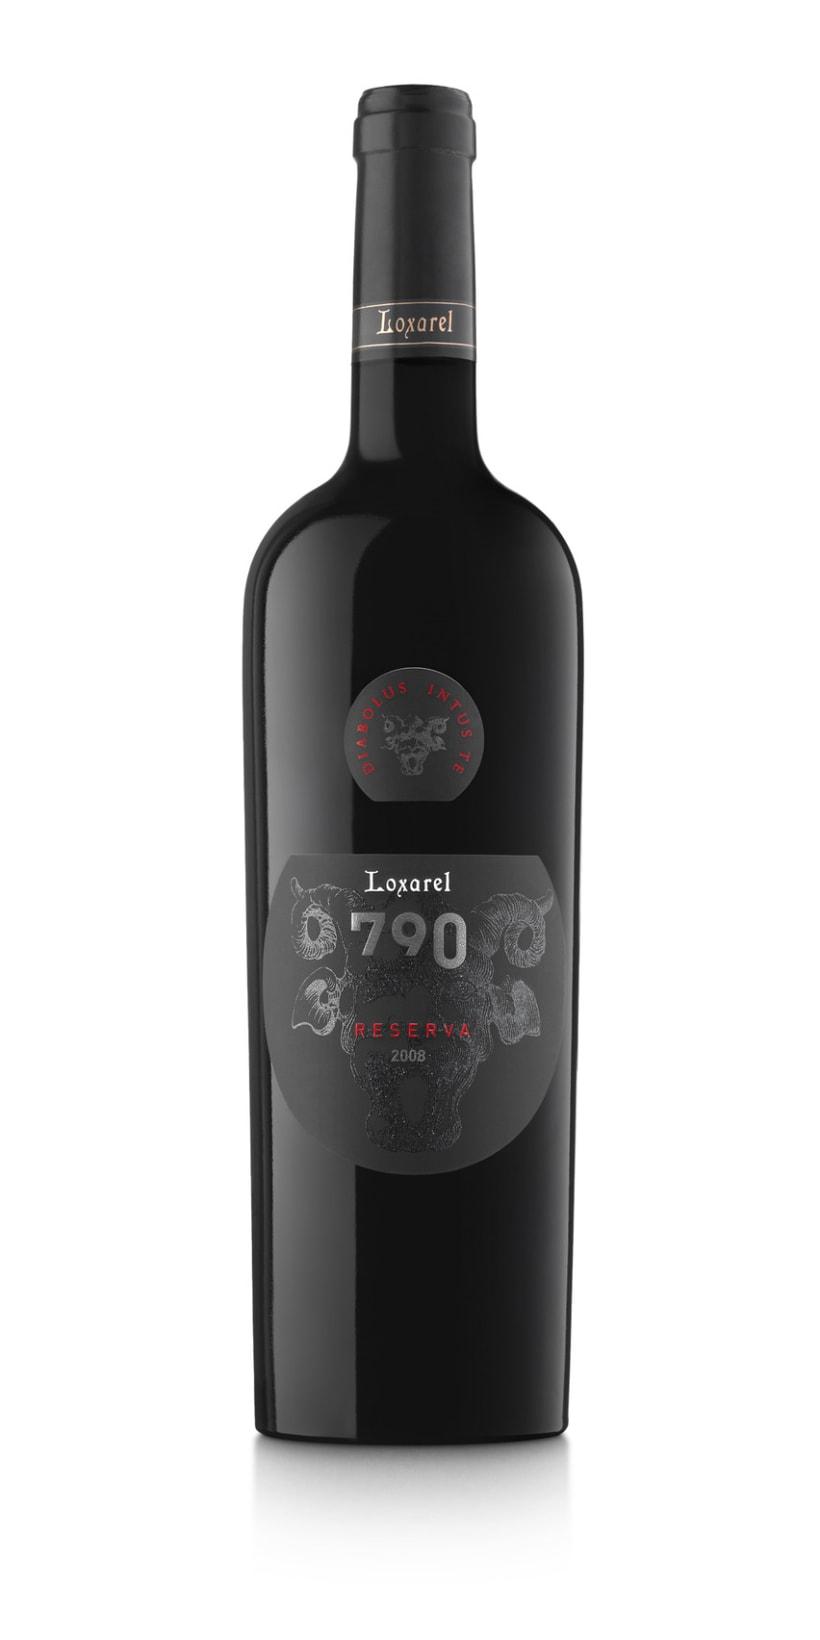 790 Loxarel 2